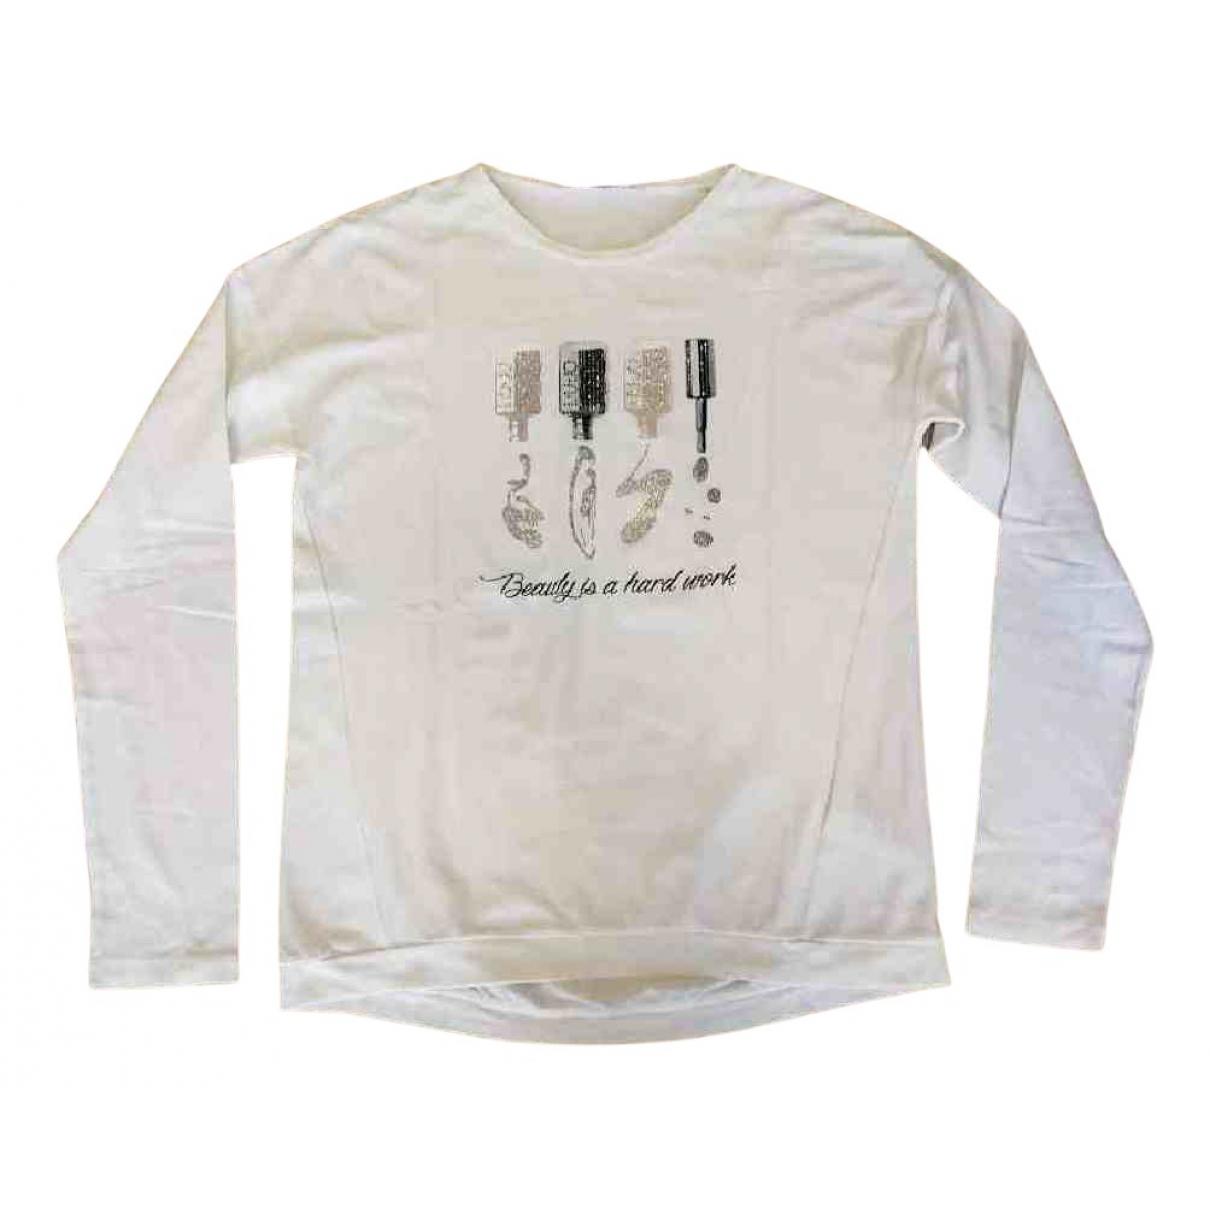 Liu.jo N White Cotton  top for Kids 16 years - M FR